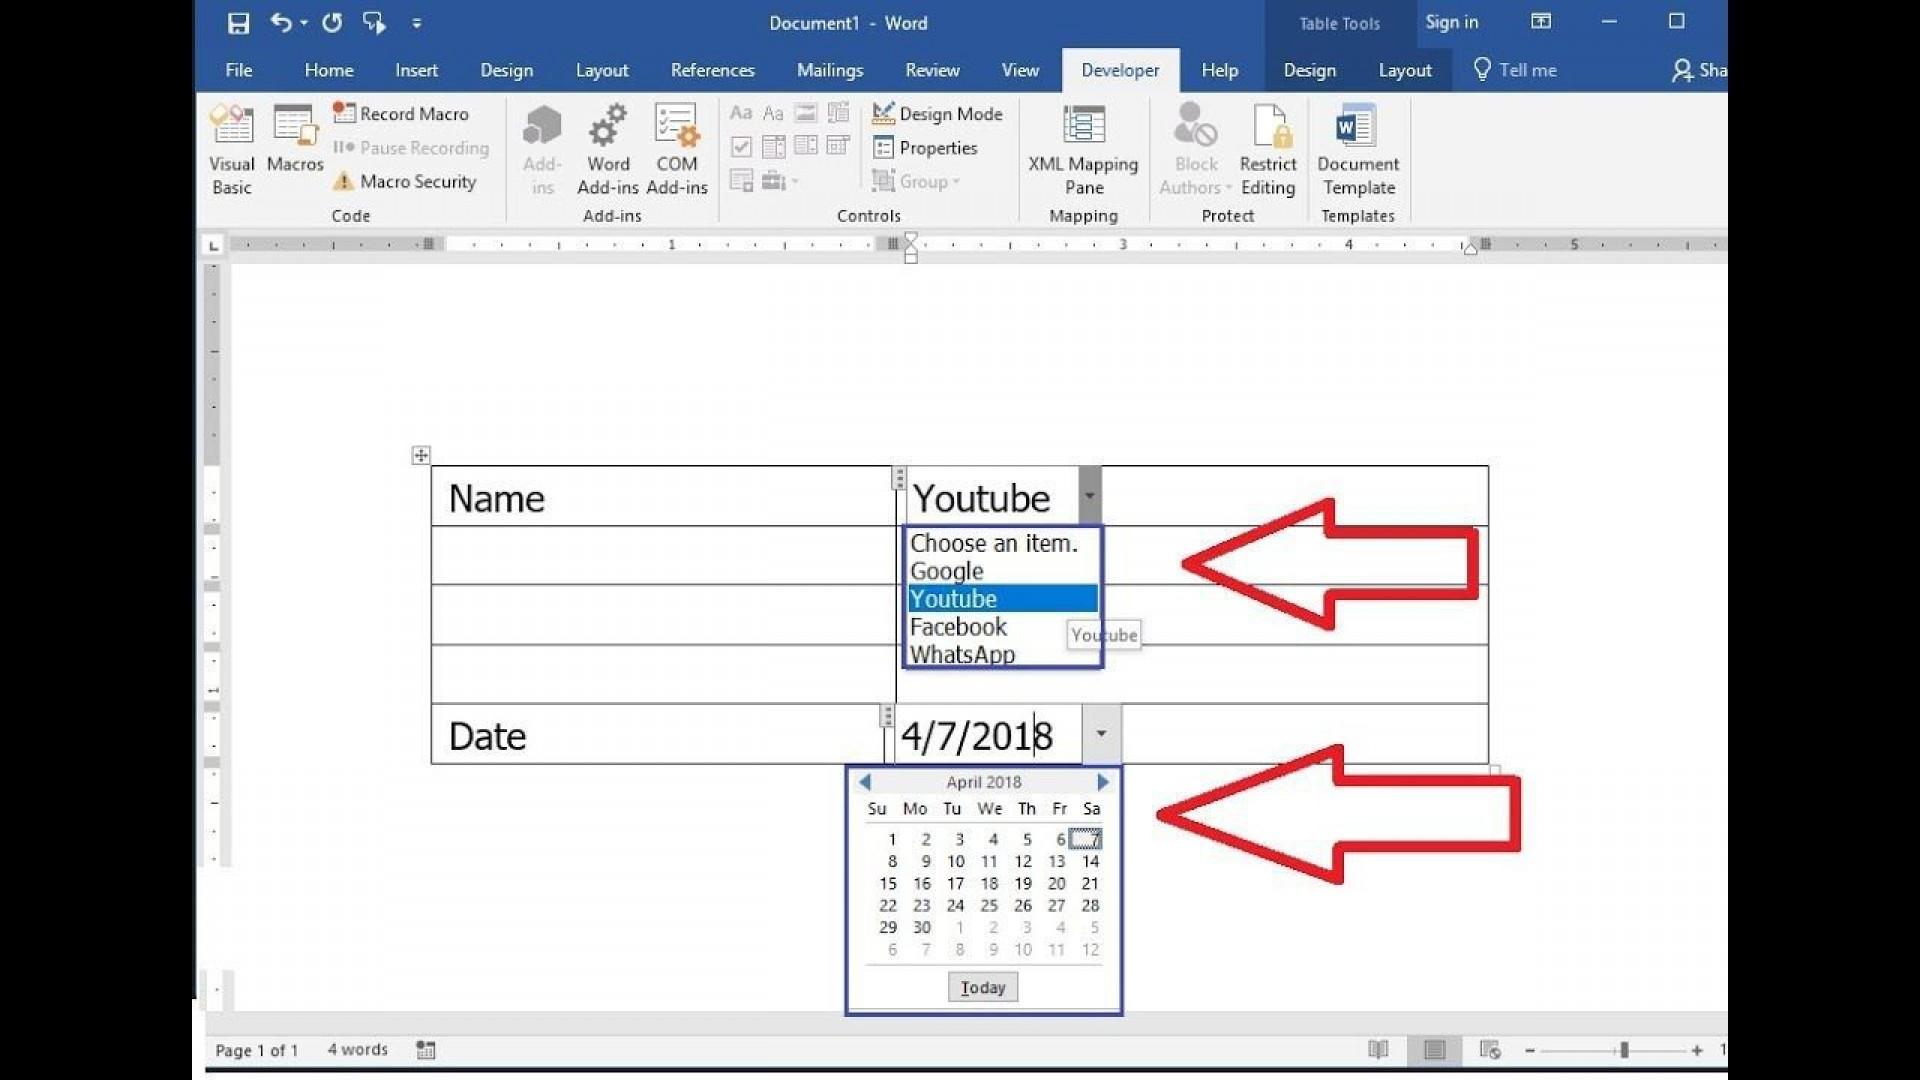 006 Dreaded Calendar Template For Word 2010 Highest Quality  2019 Microsoft1920